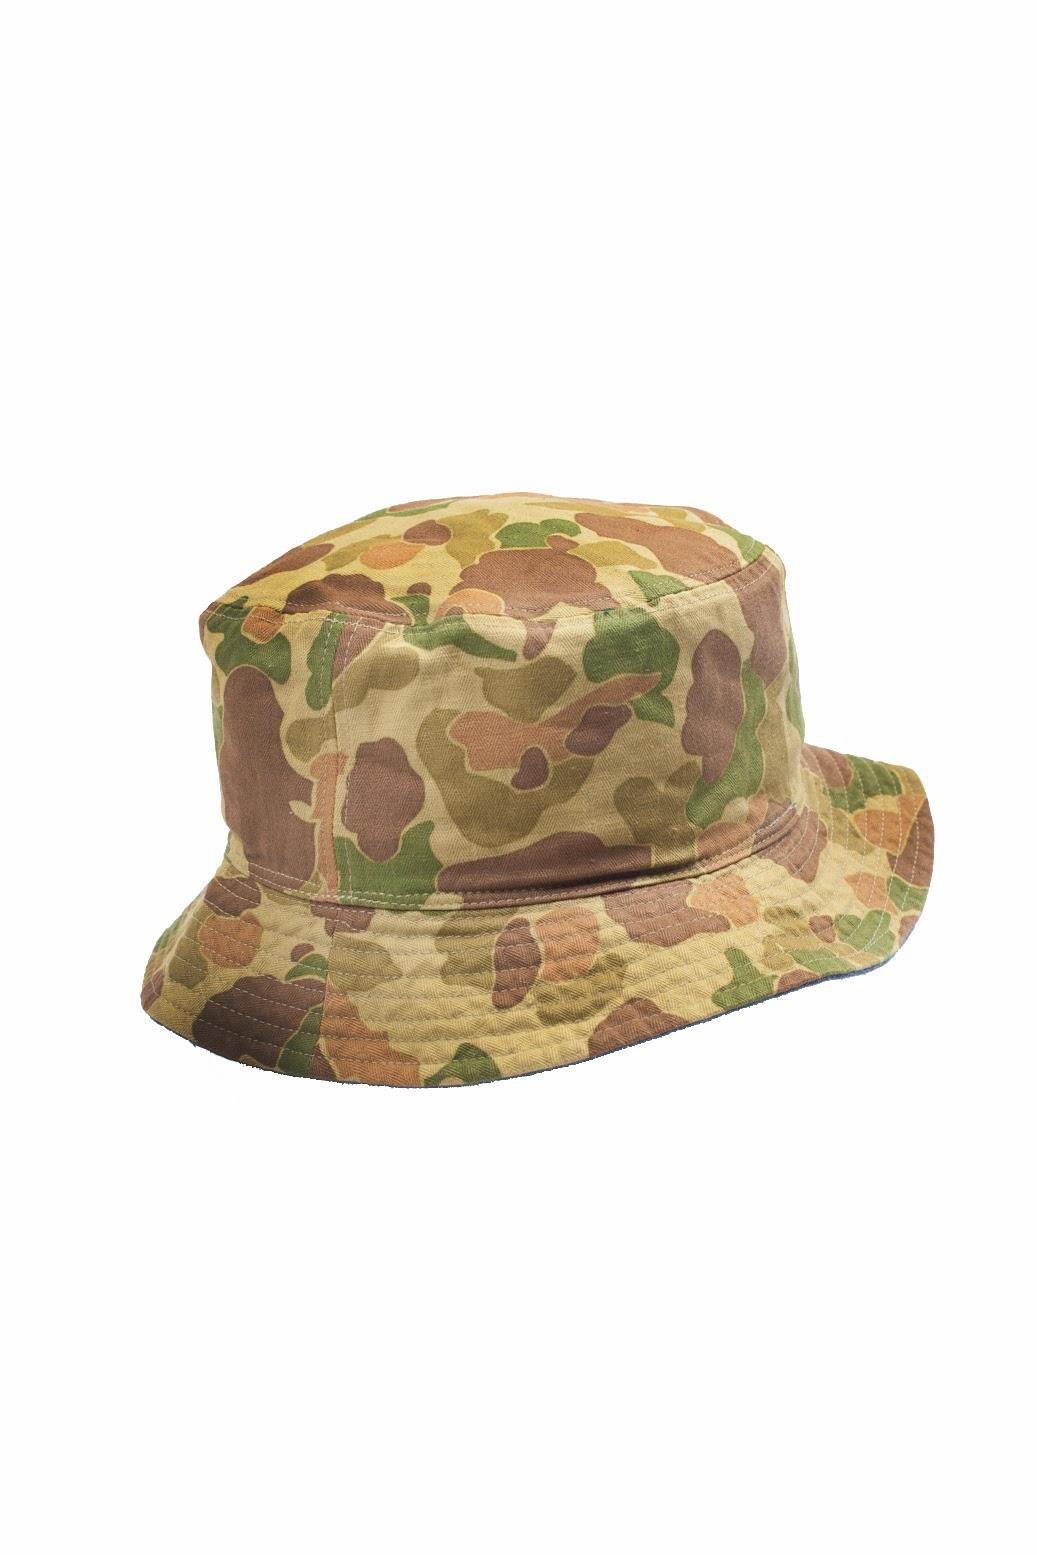 JL_CAMO_HAT_01.jpg